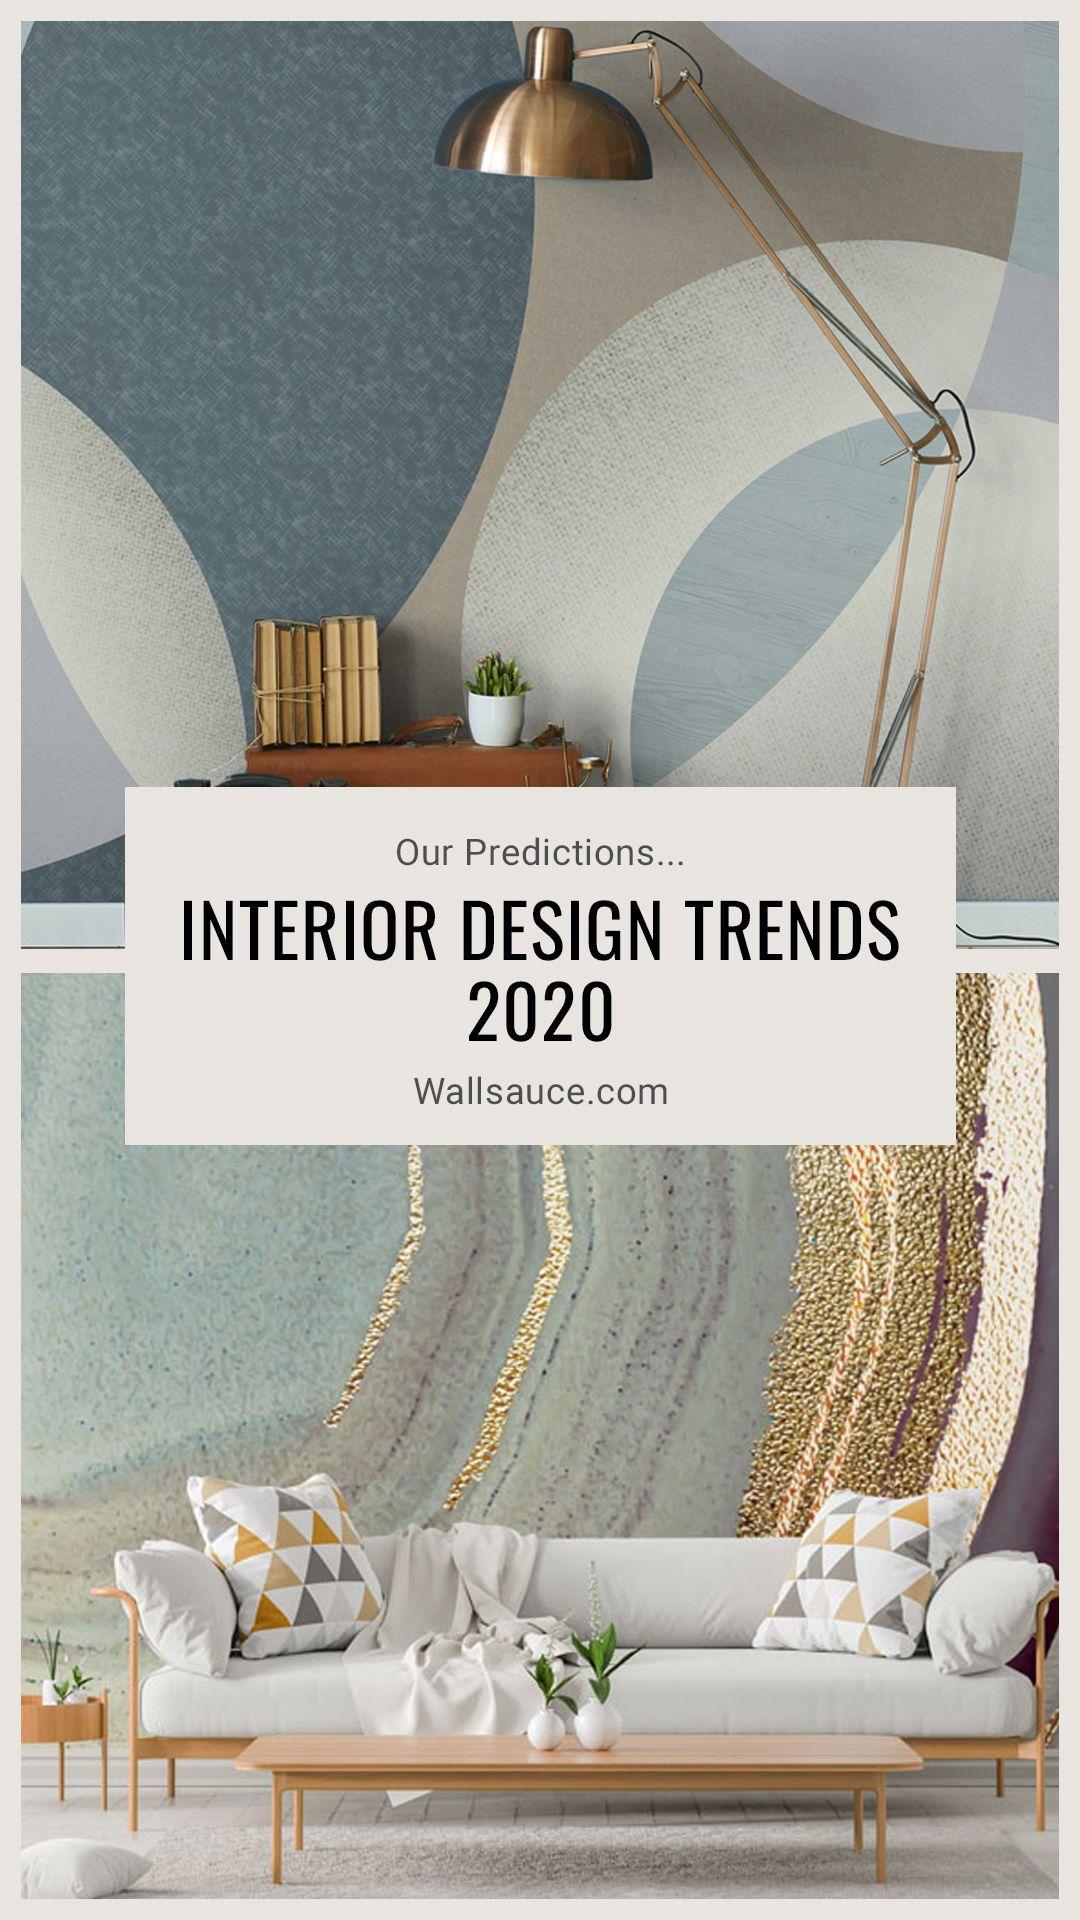 Interior Design Trends 2020 Our Predictions Wallpaper Interior